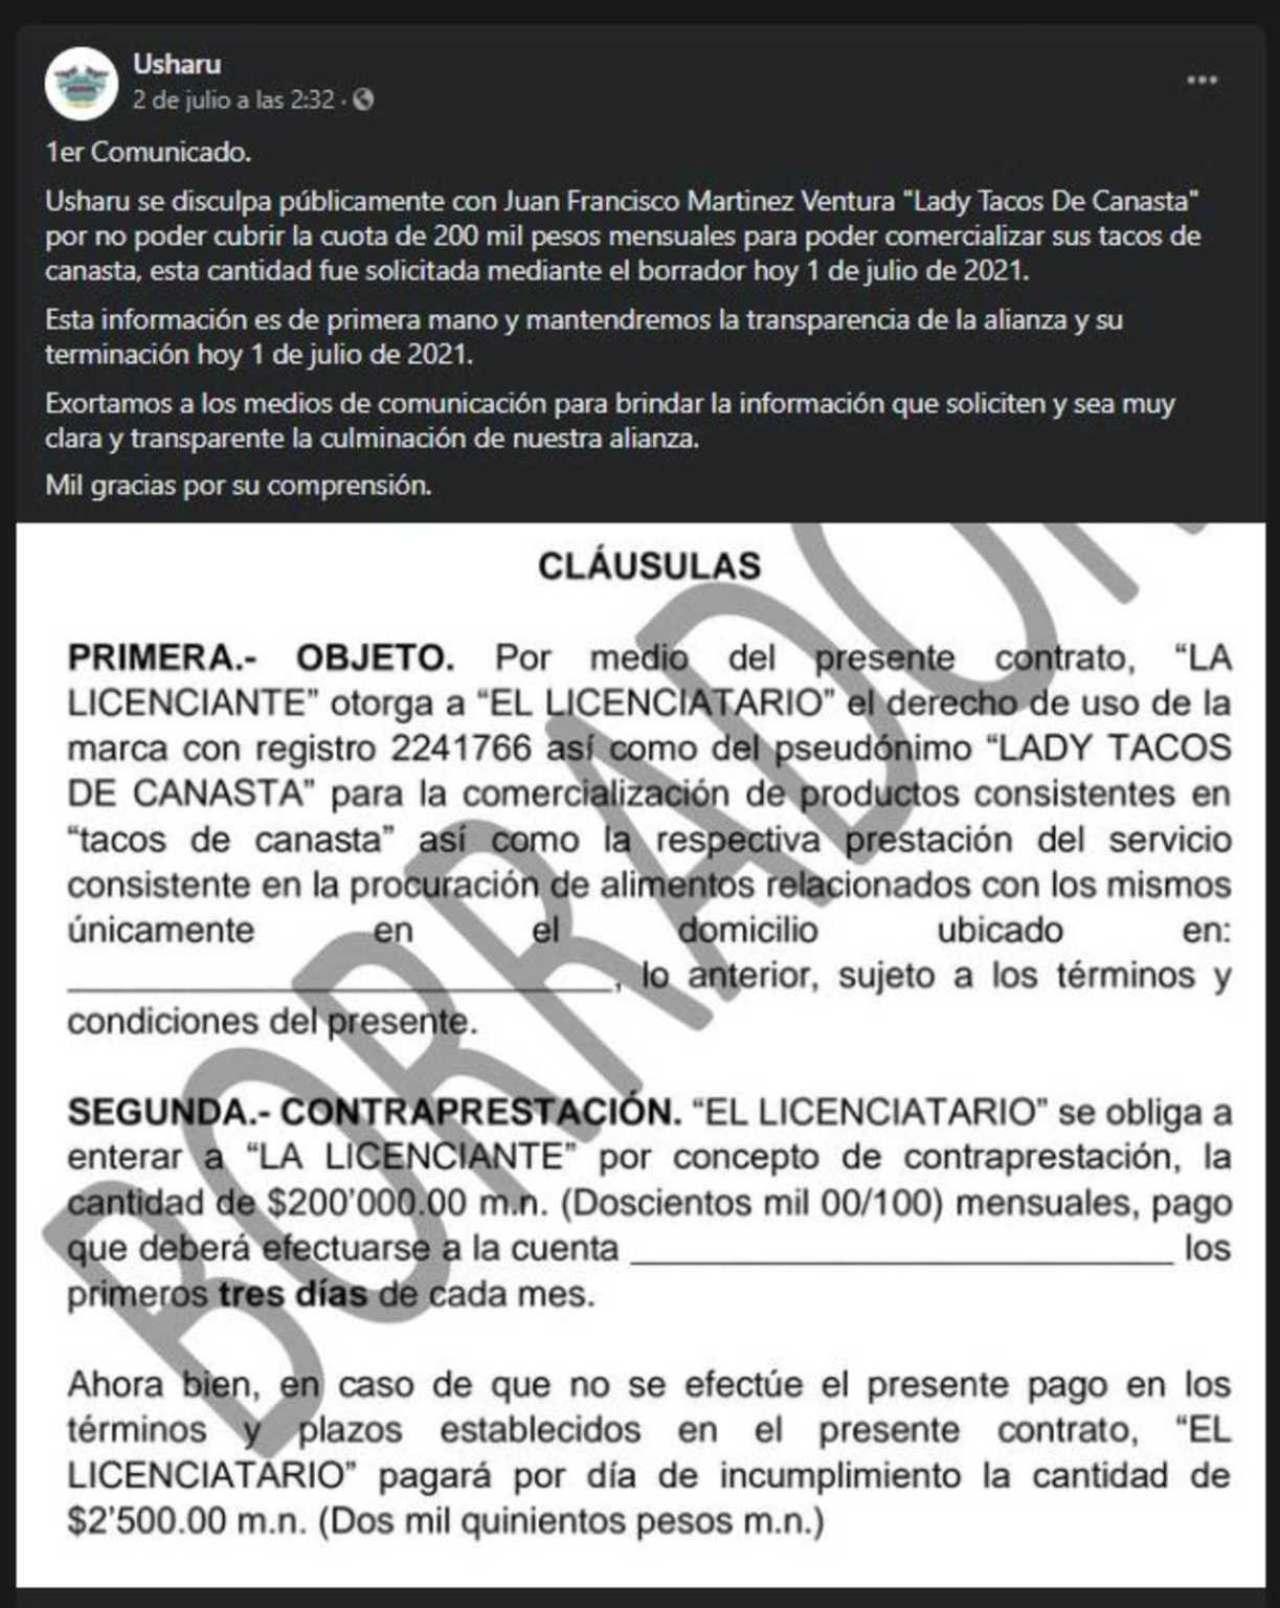 restaurante Lady Tacos Canasta 200 mil